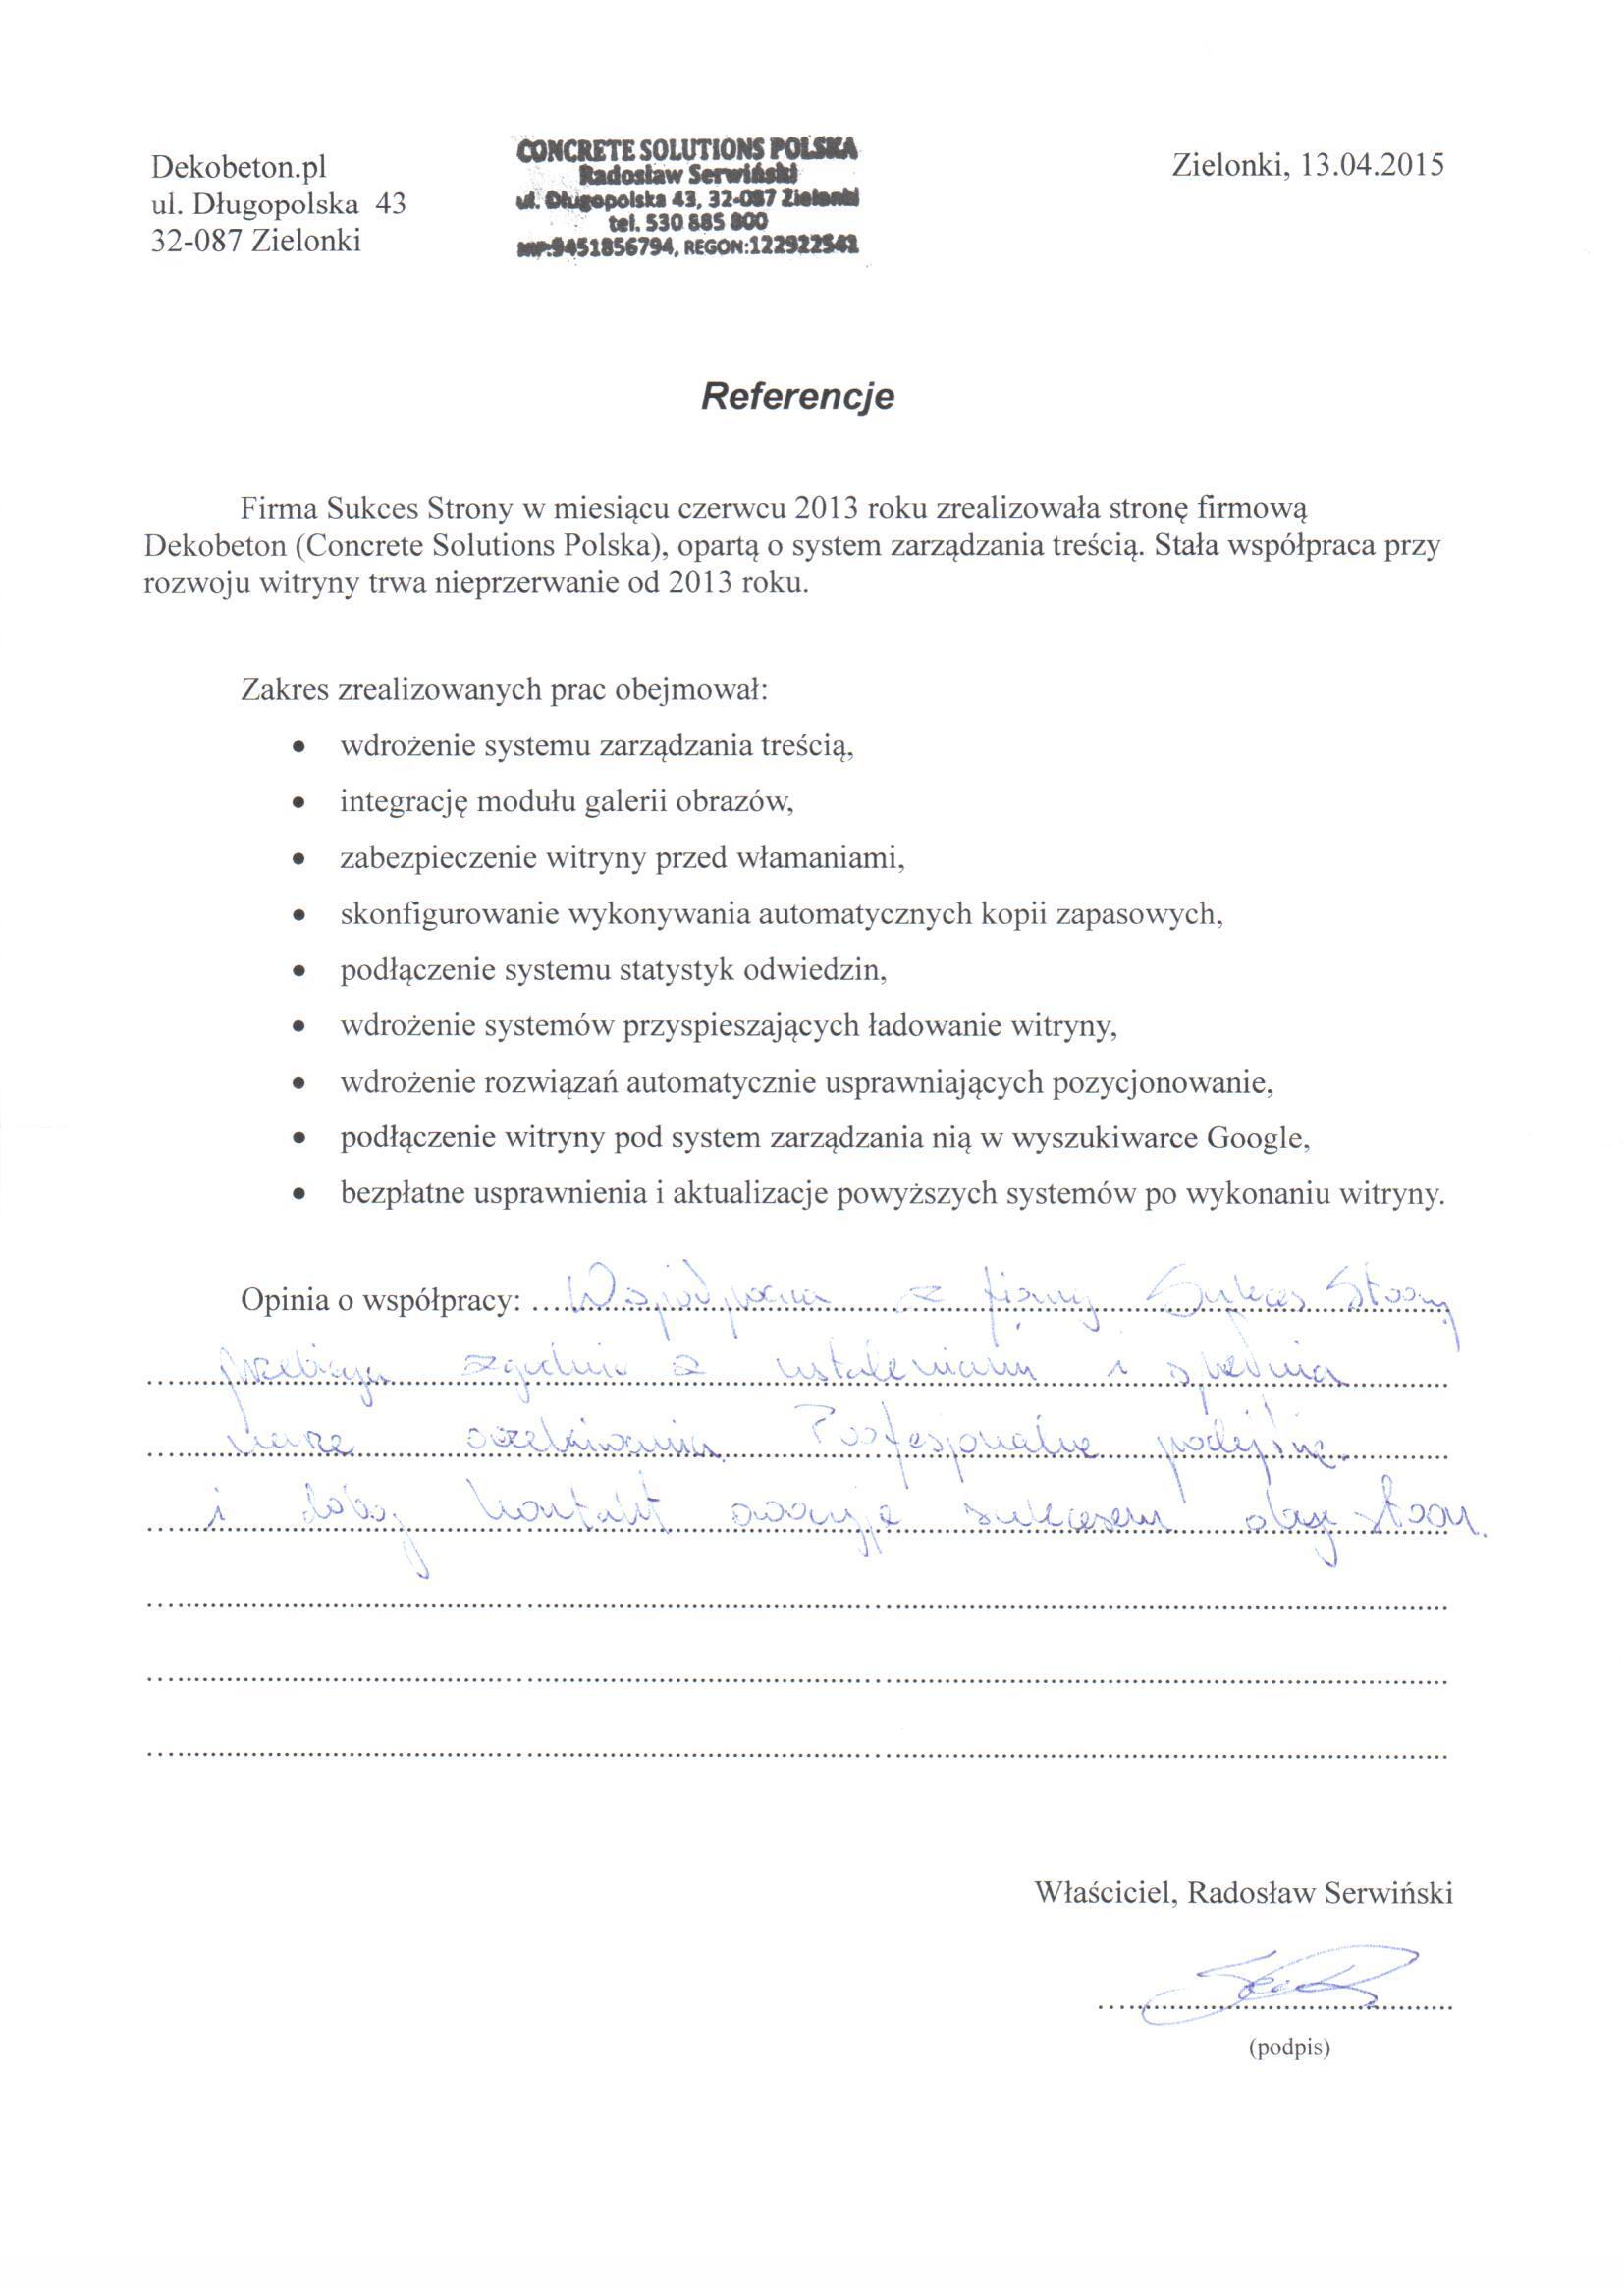 Referencje - Dekobeton